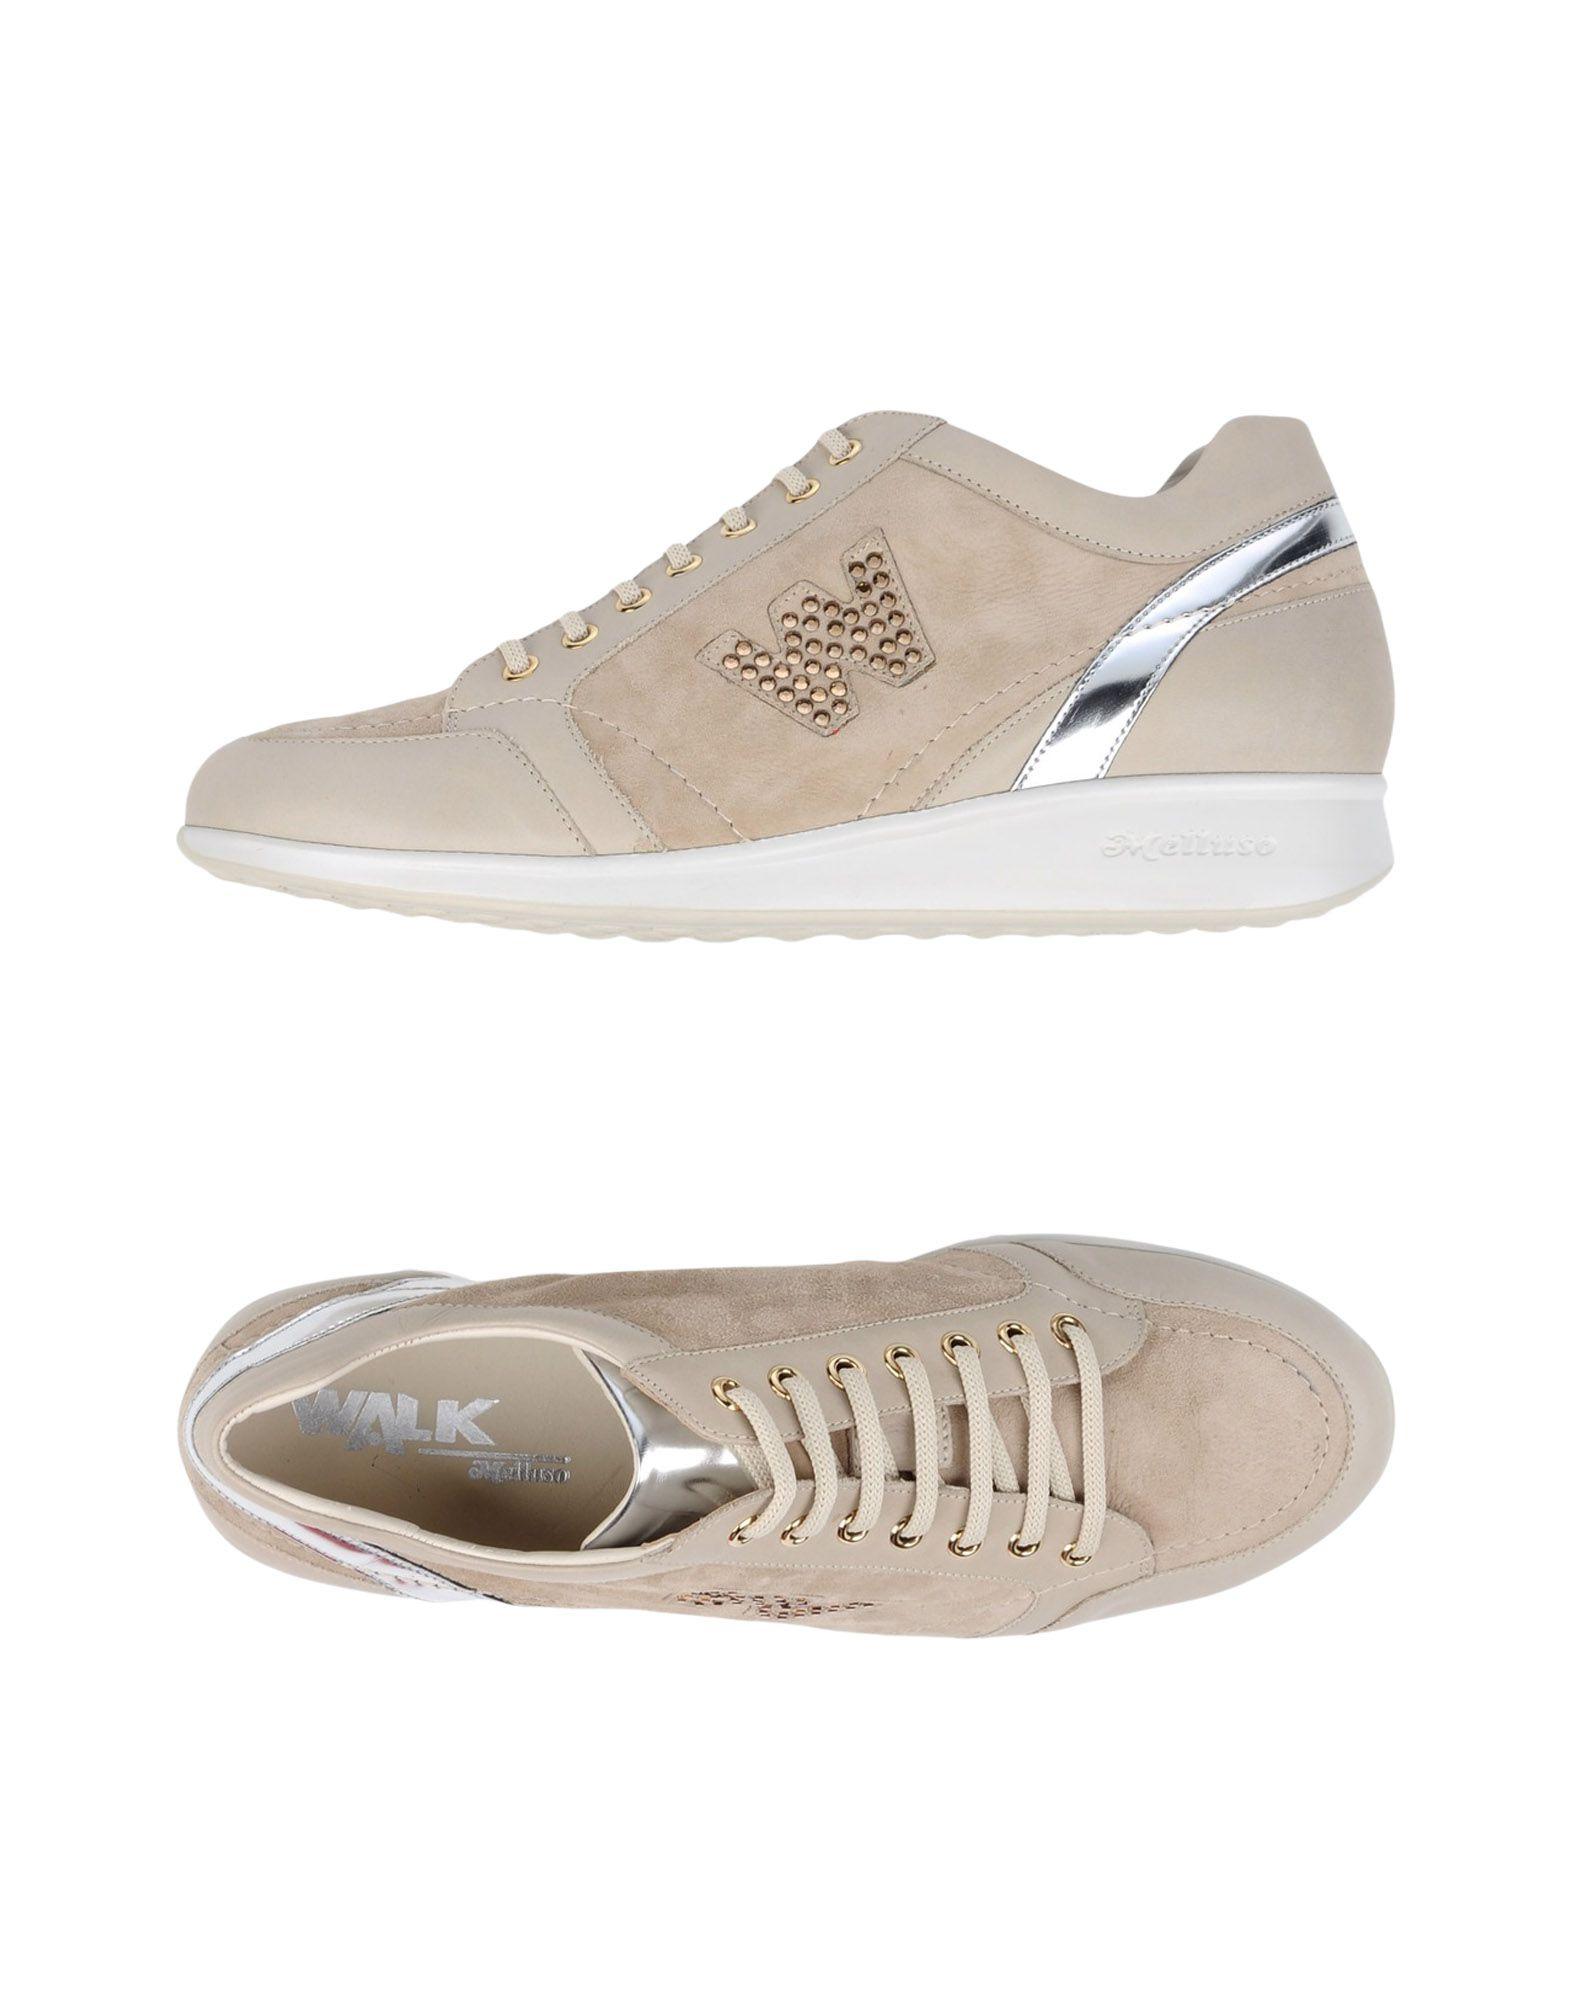 WALK by MELLUSO Обувь на шнурках цены онлайн